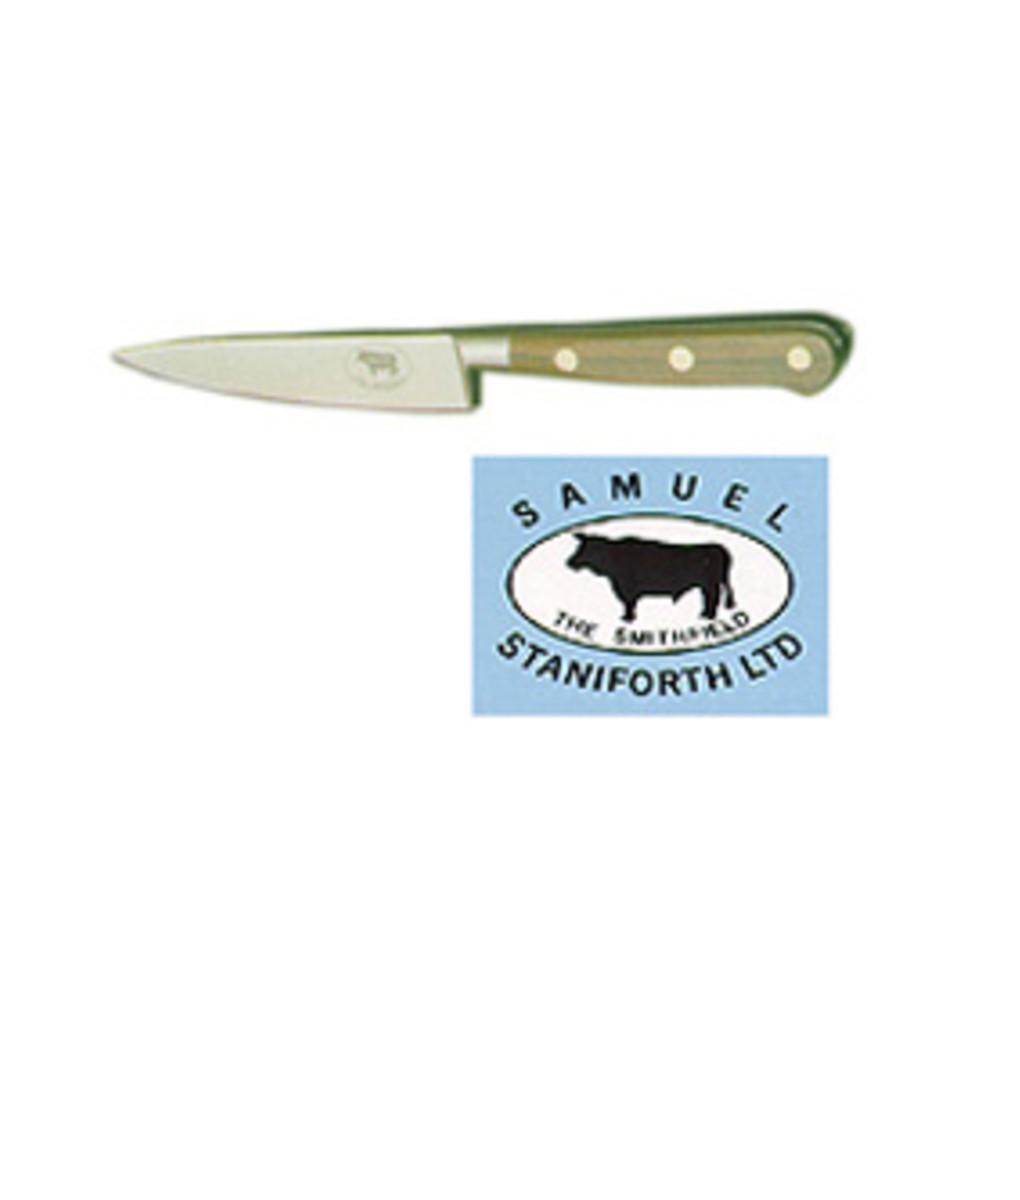 Smithfield Paring Knife 10cm